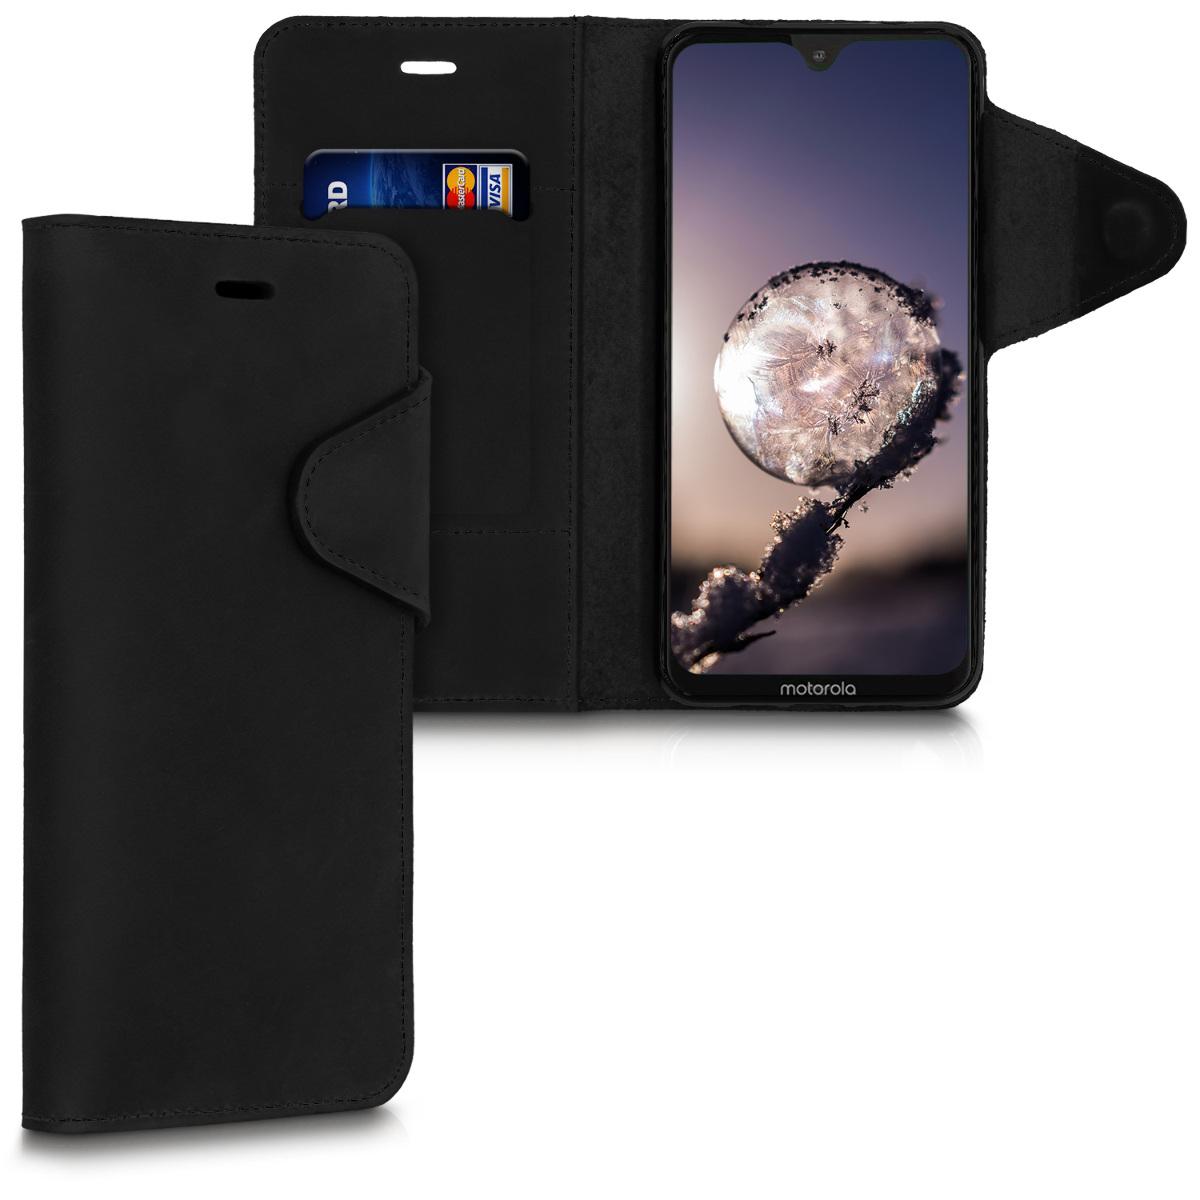 Kožené pouzdro | obal pro Motorola Moto G7 / Moto G7 Plus - Černá